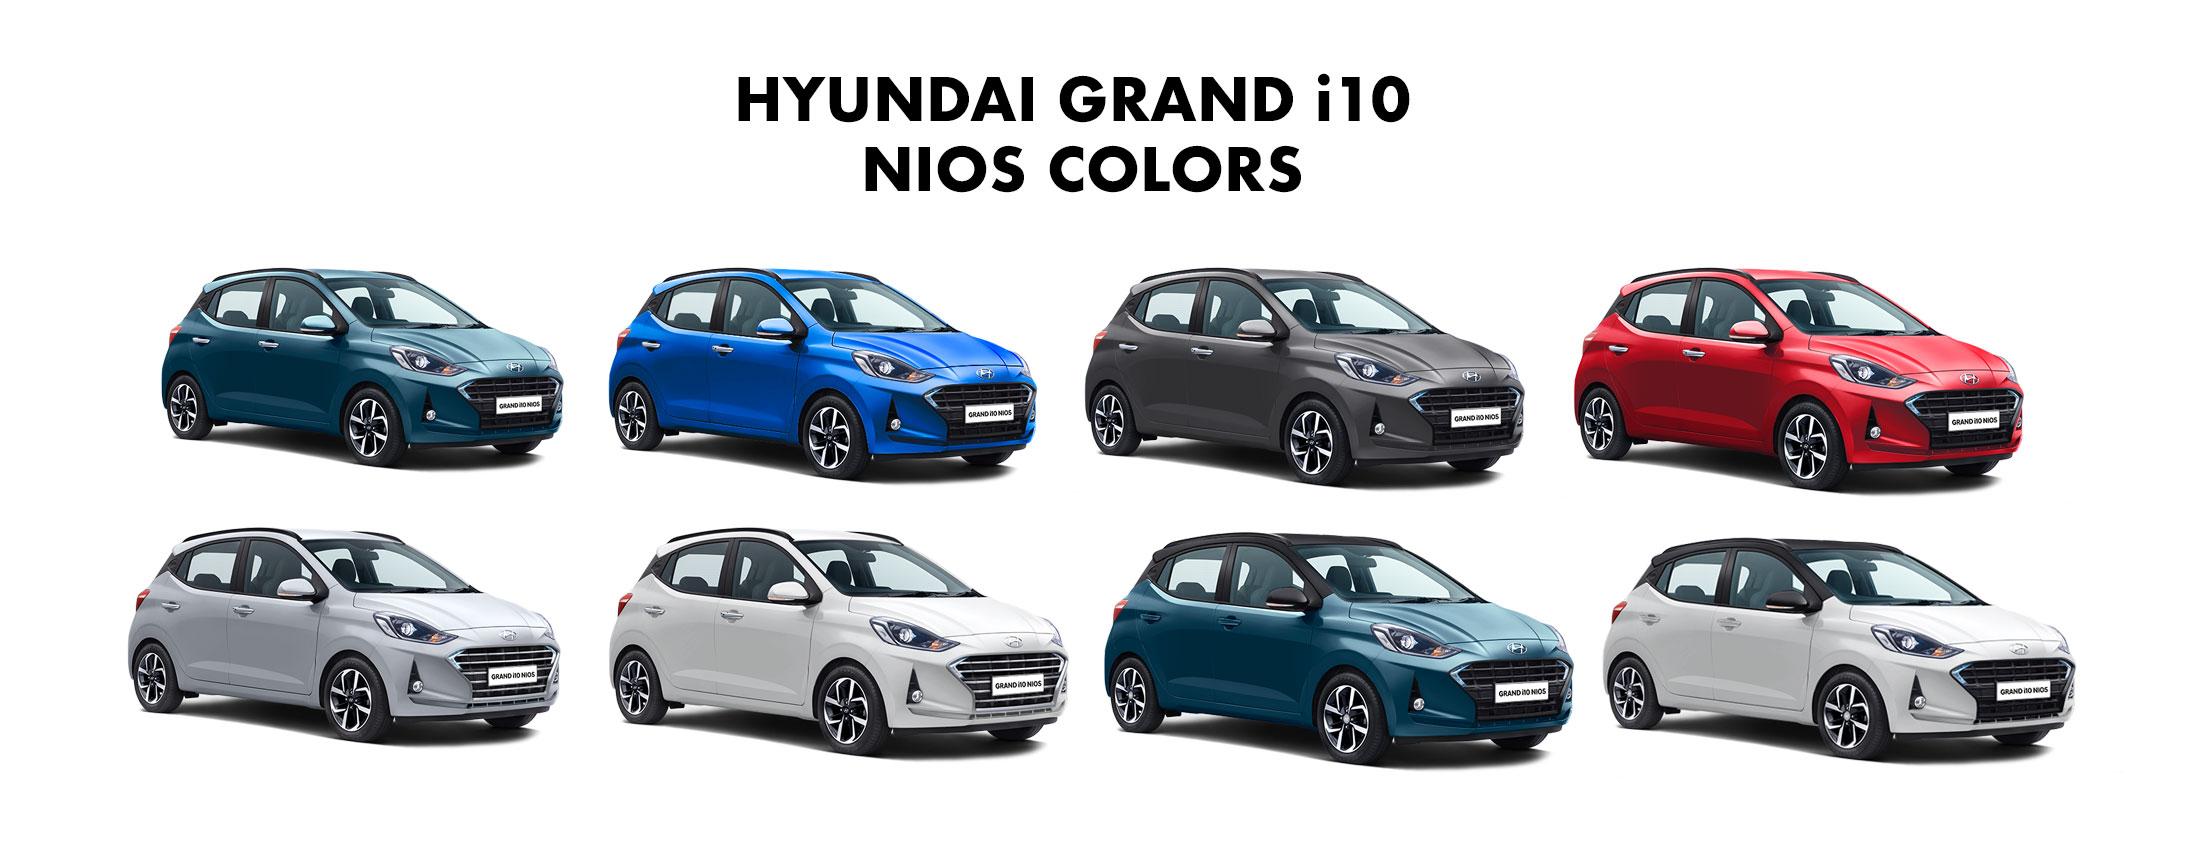 Hyundai Grand I10 Nios Colors Red Grey Silver White